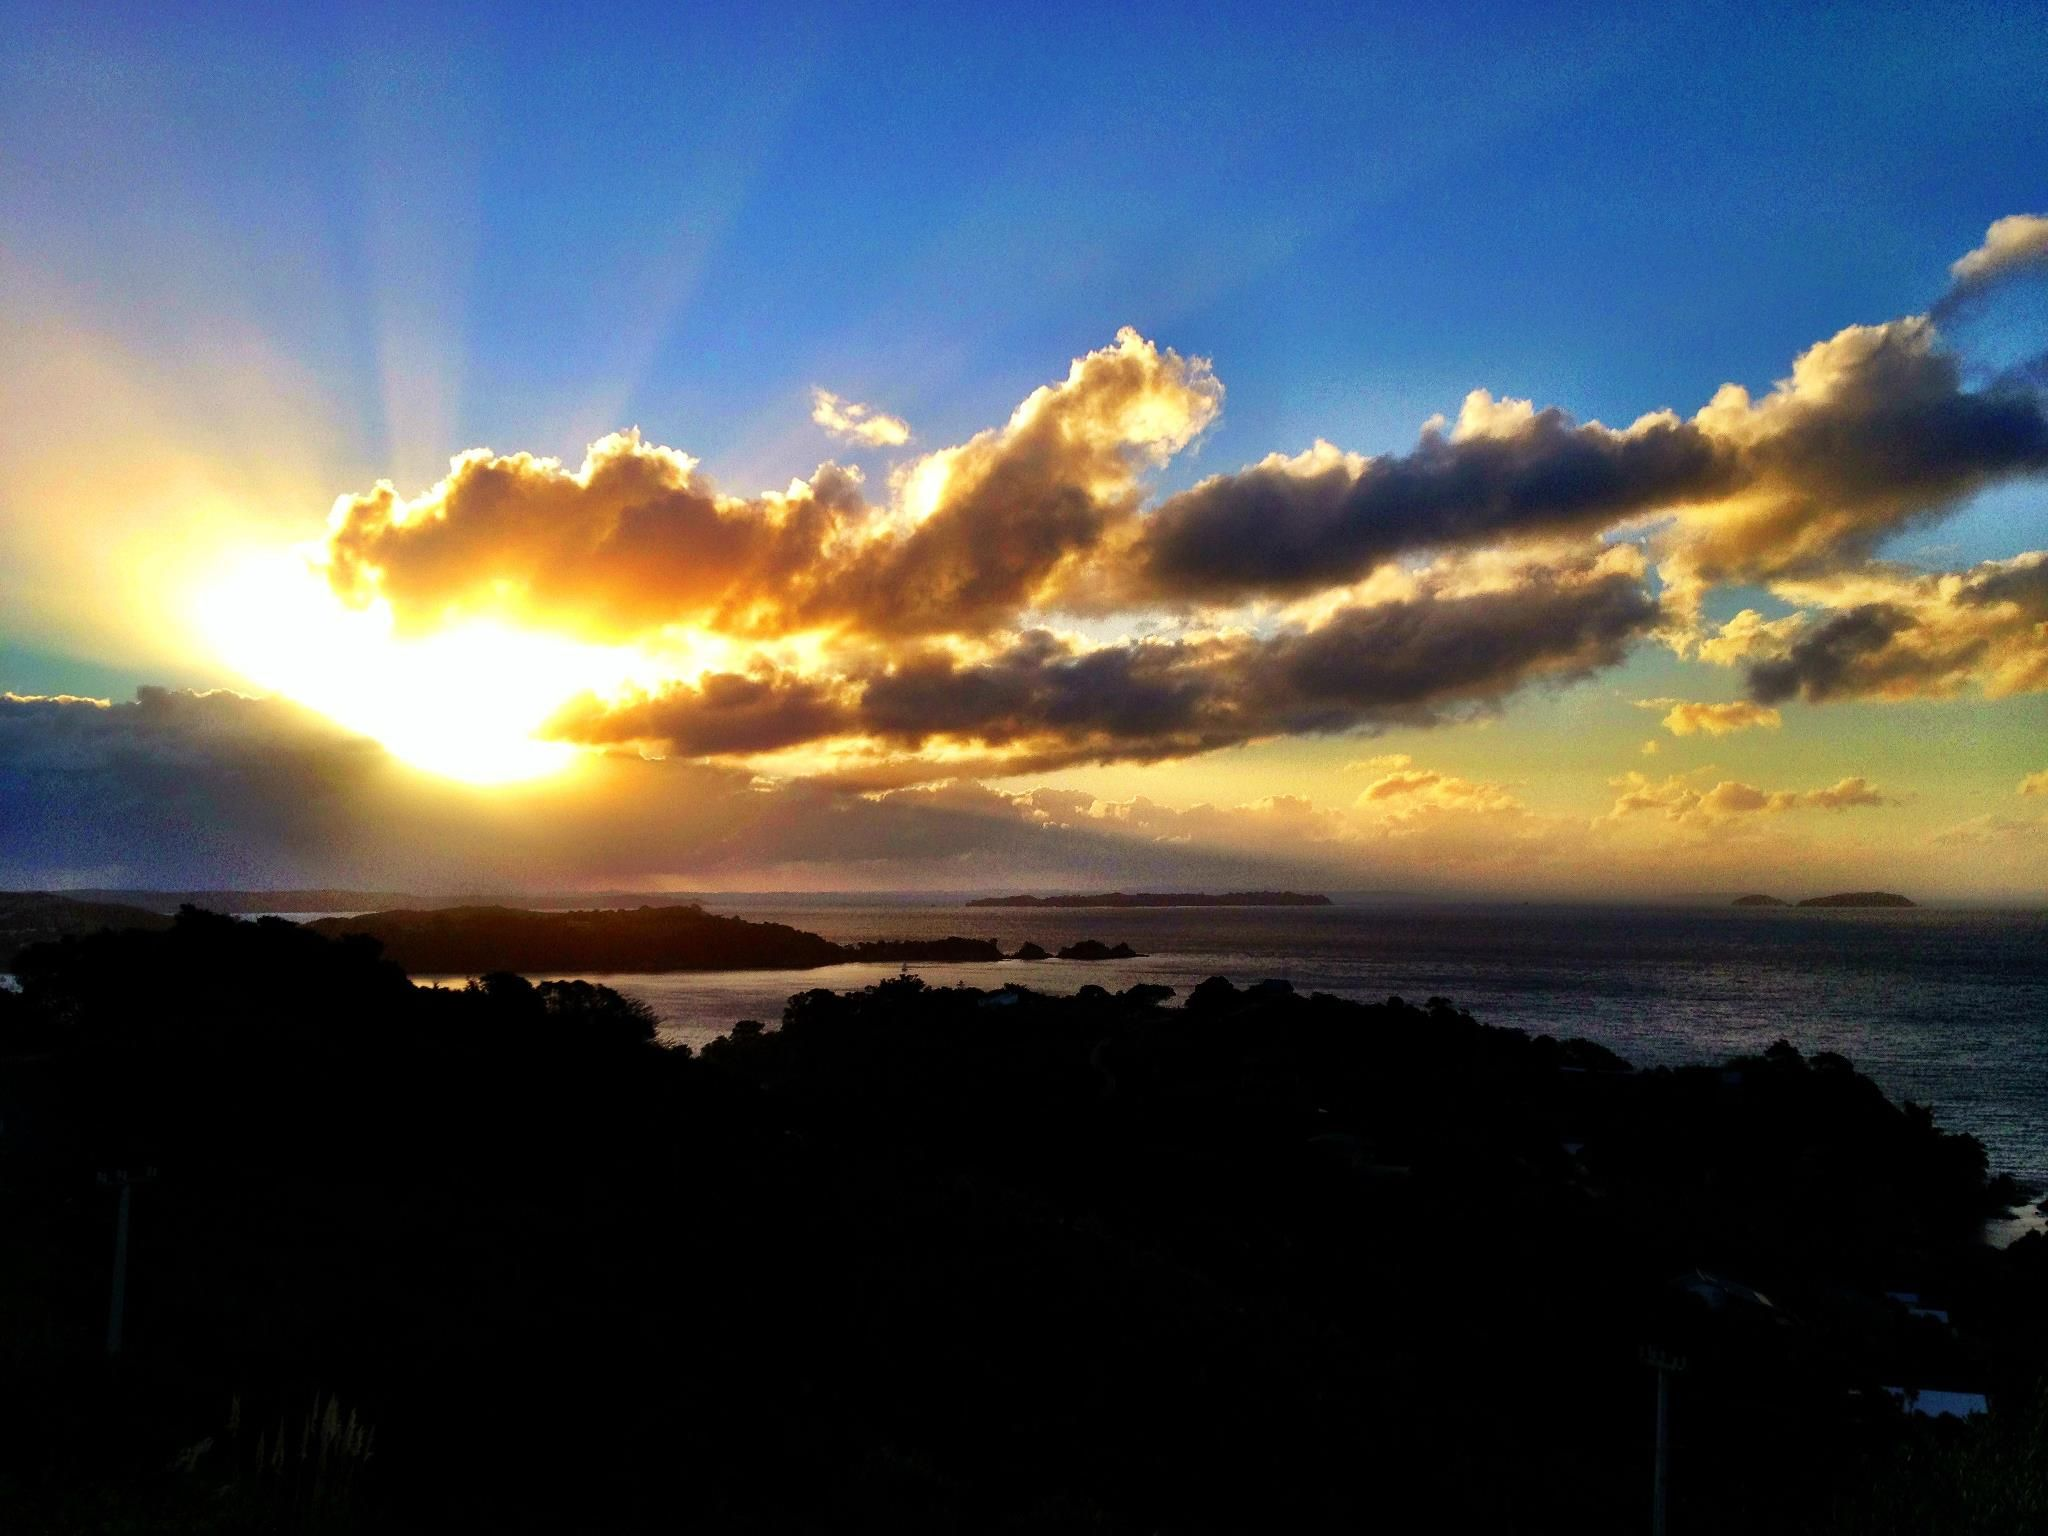 Sunset over Waiheke